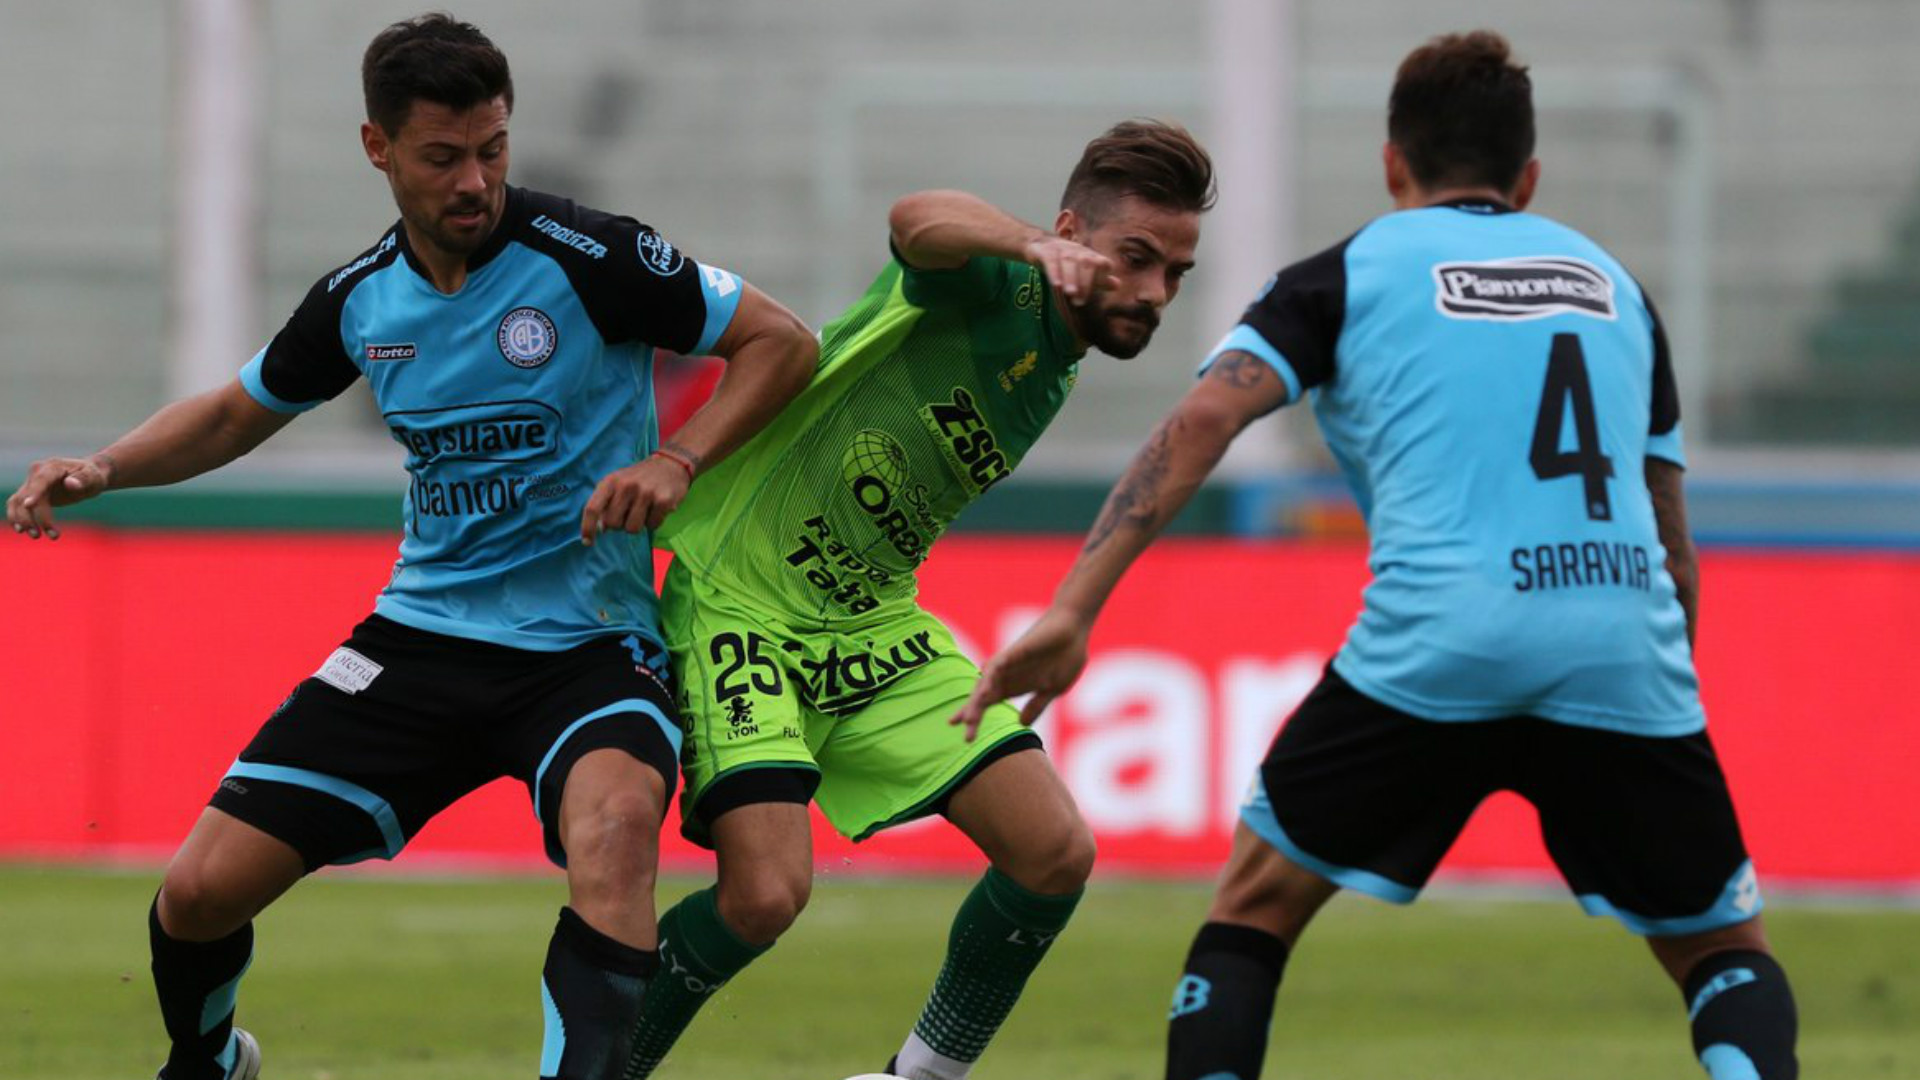 Belgrano V Defensa Y Justicia Cronica Del Partido  Primera Division Goal Com